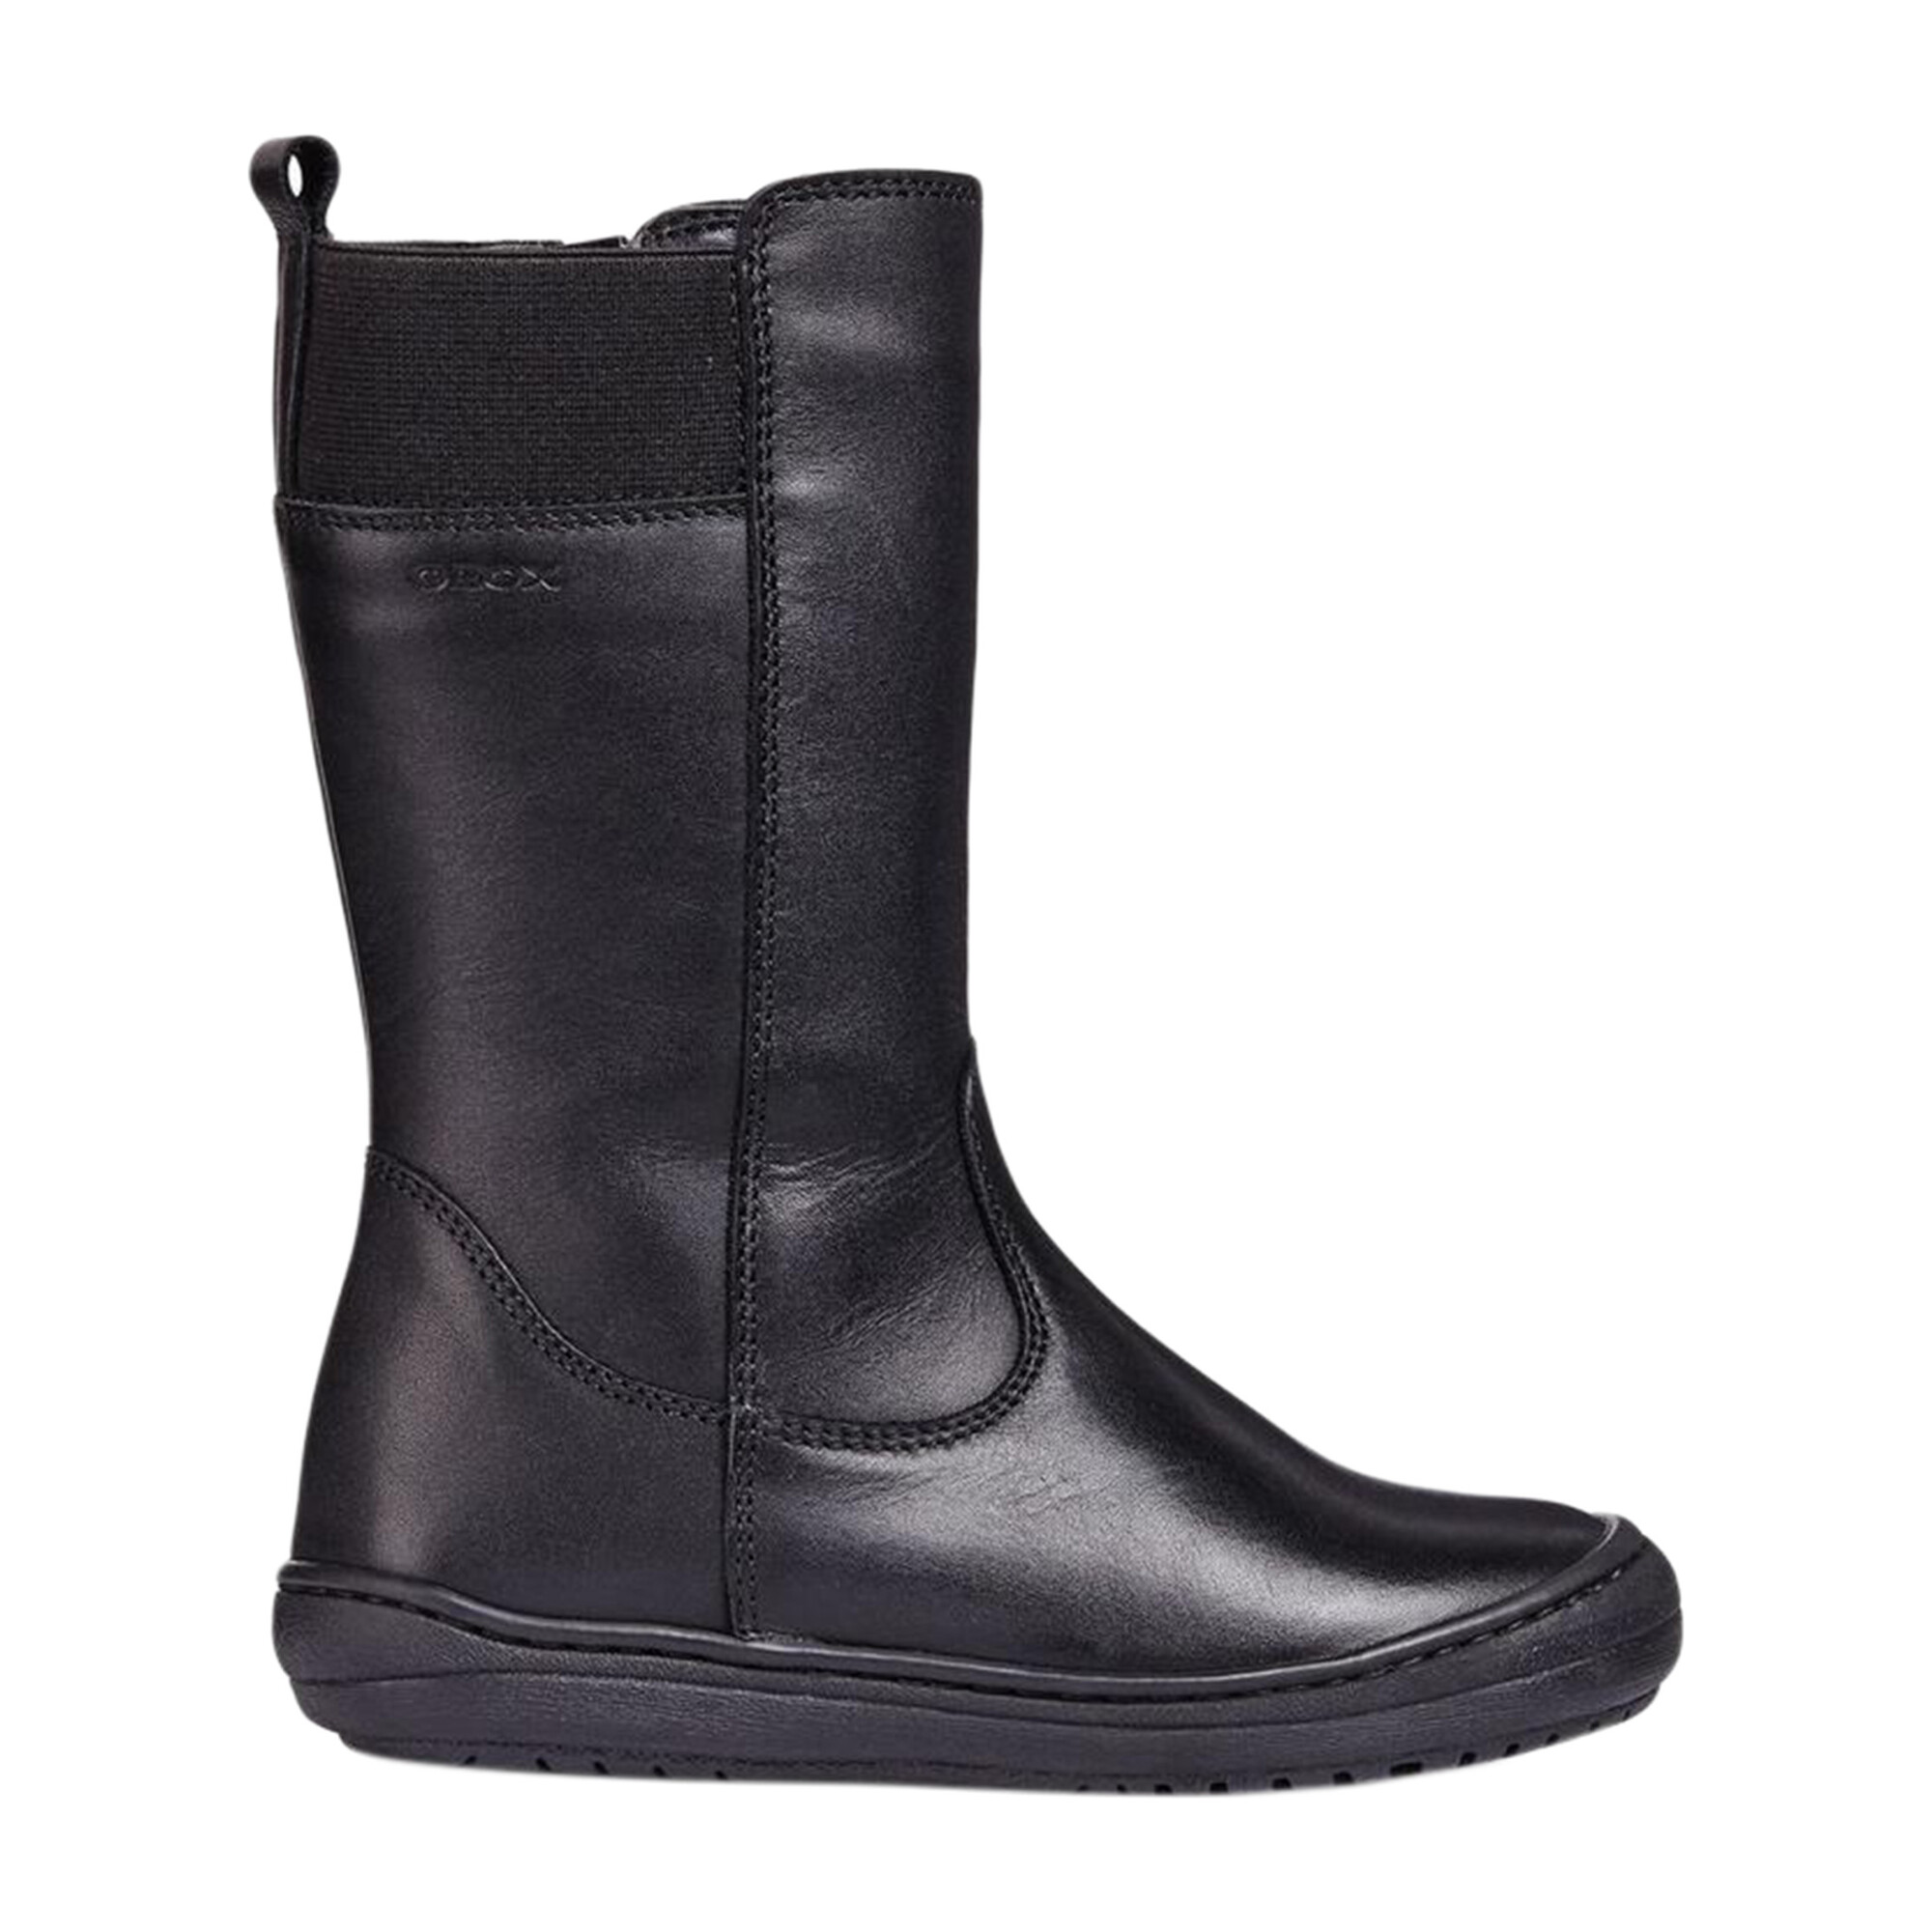 Hadriel Boot, Black